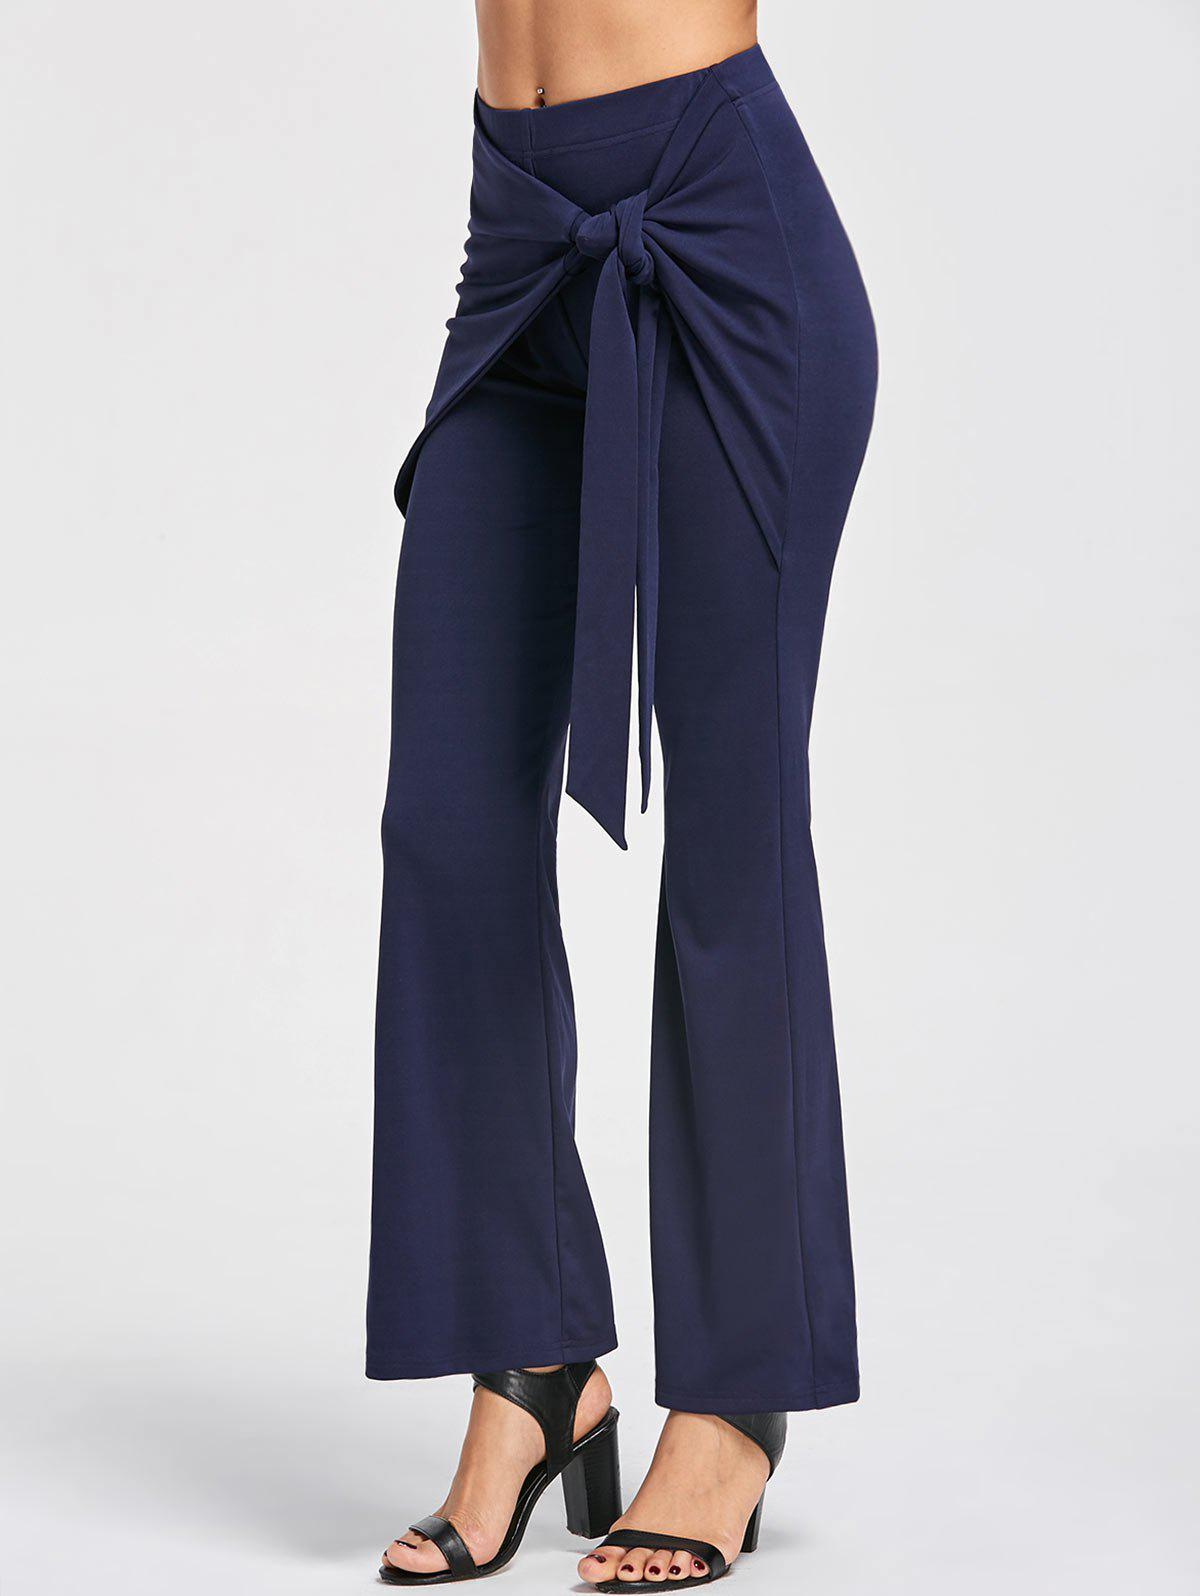 Pantalons coupe-culotte